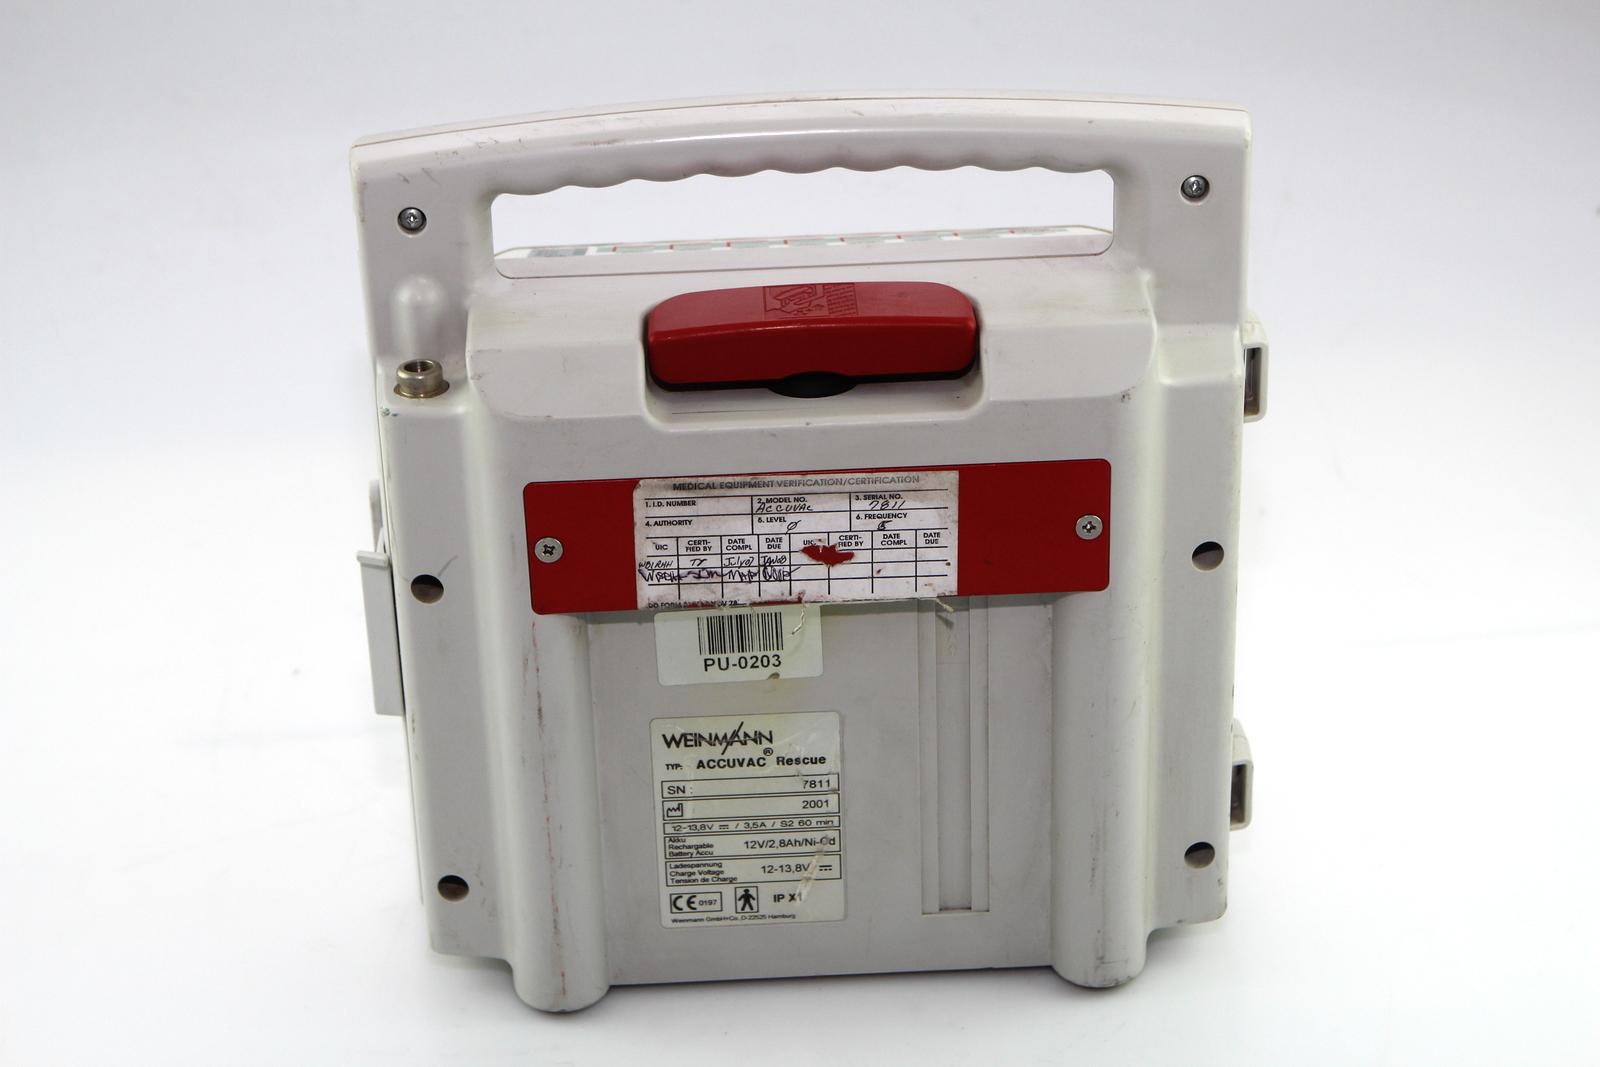 Surplus Electronic Test Equipment : Weinmann accuvac rescue ebay